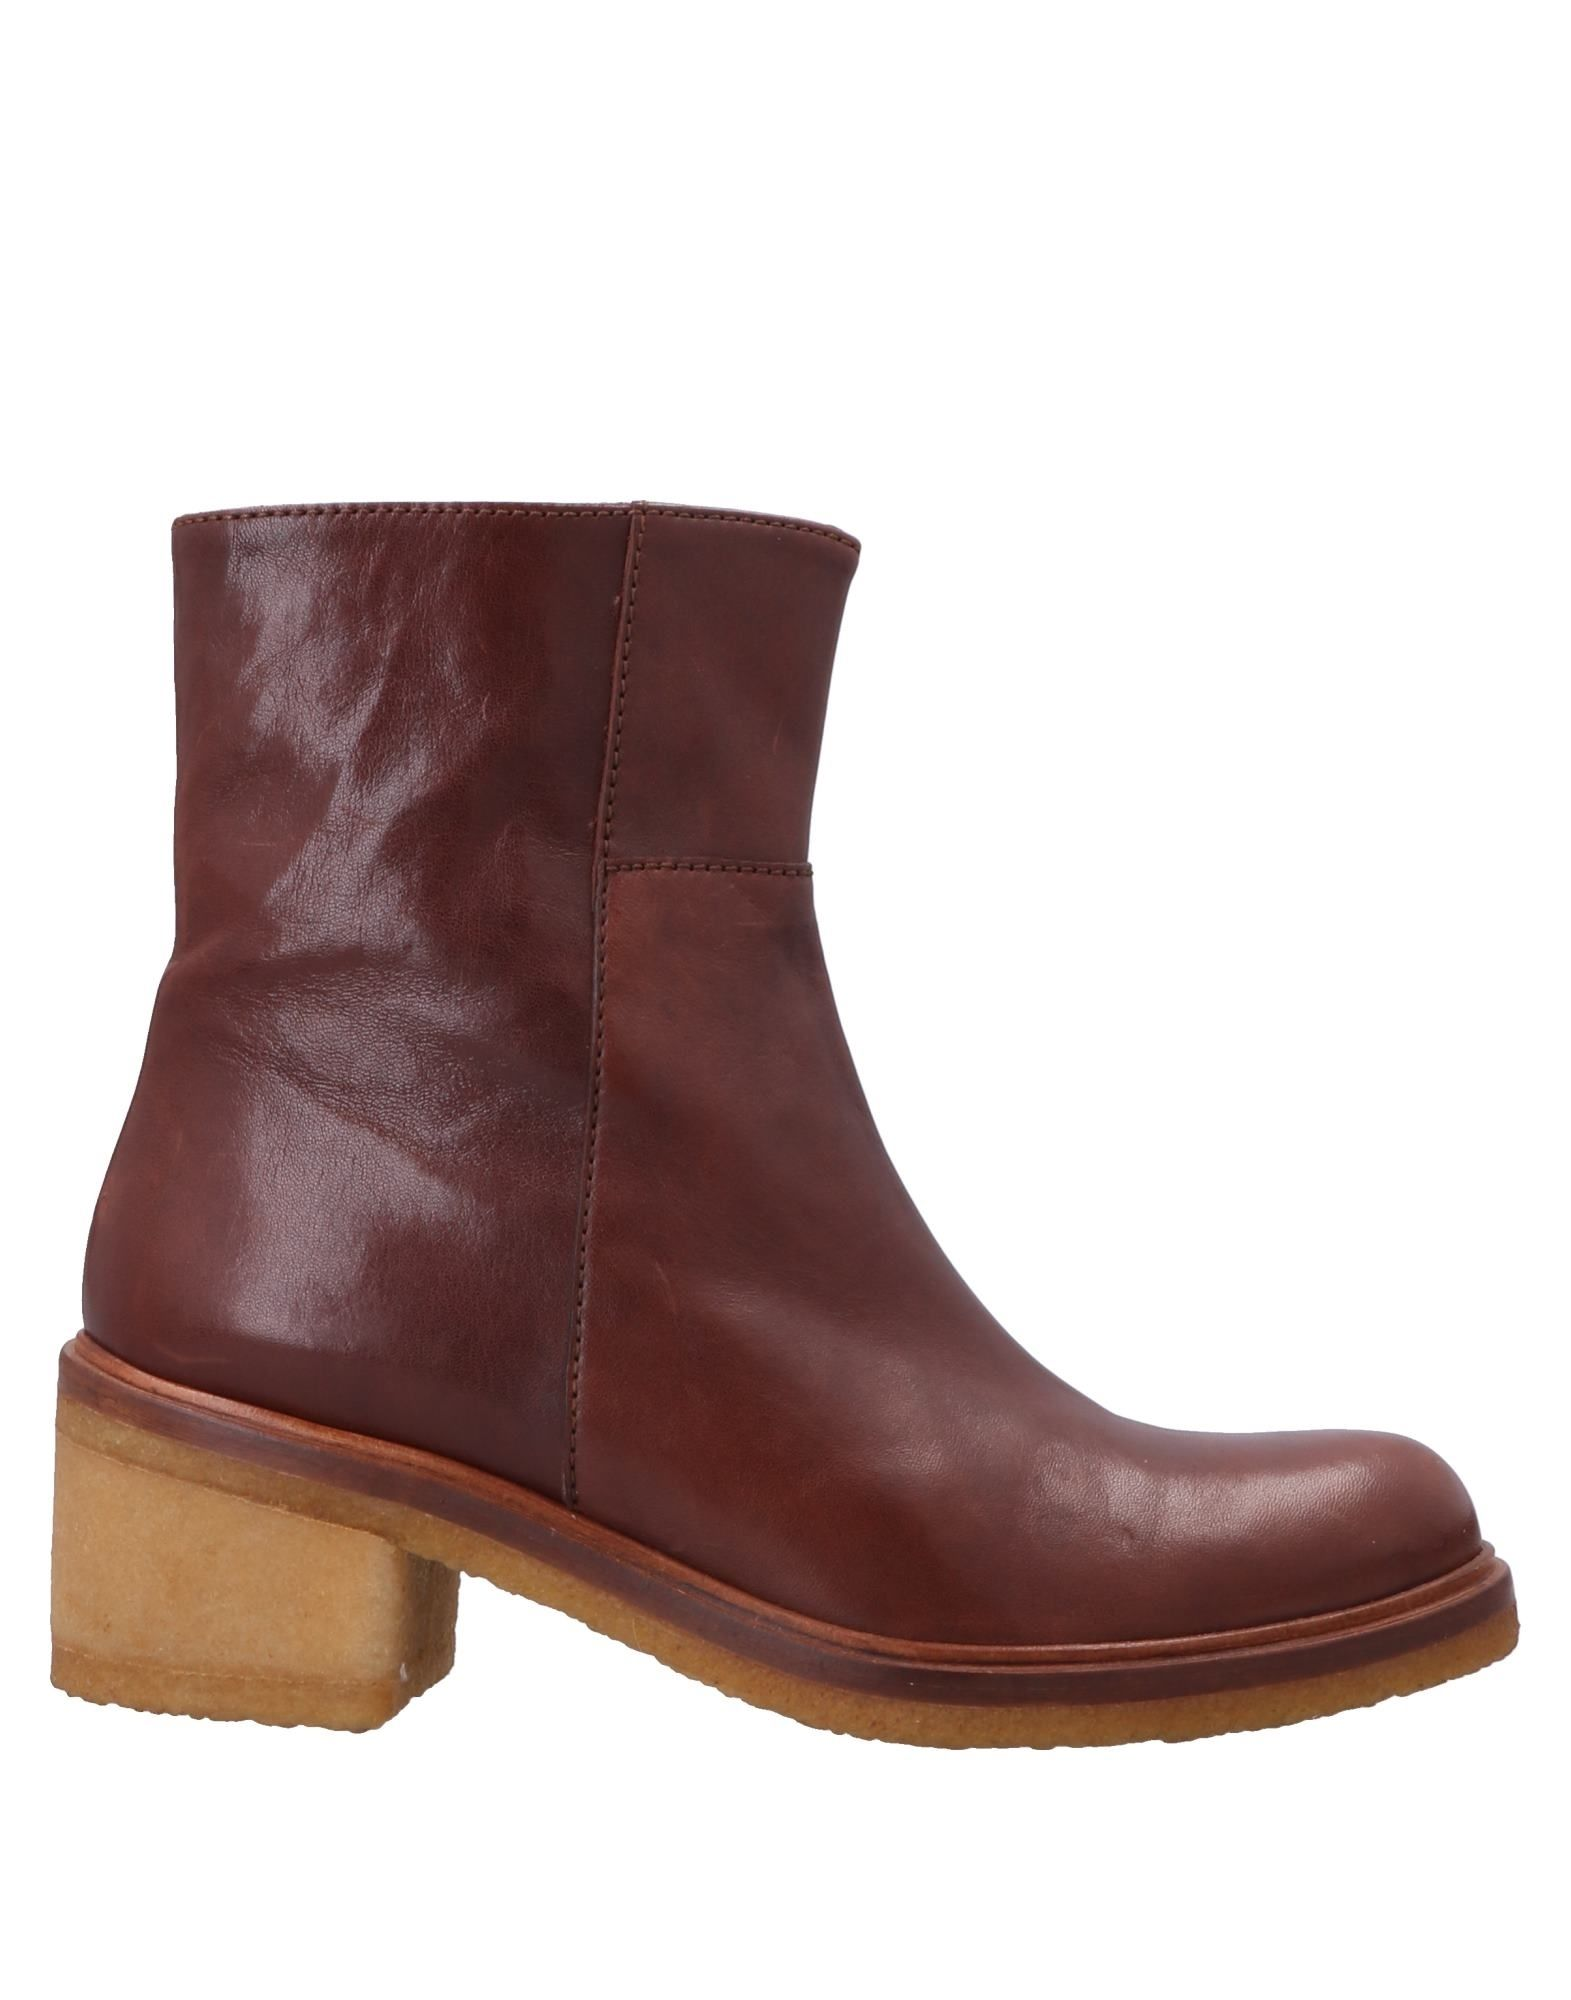 Stilvolle billige Schuhe Schuhe Schuhe C 11526933HS 214ca2